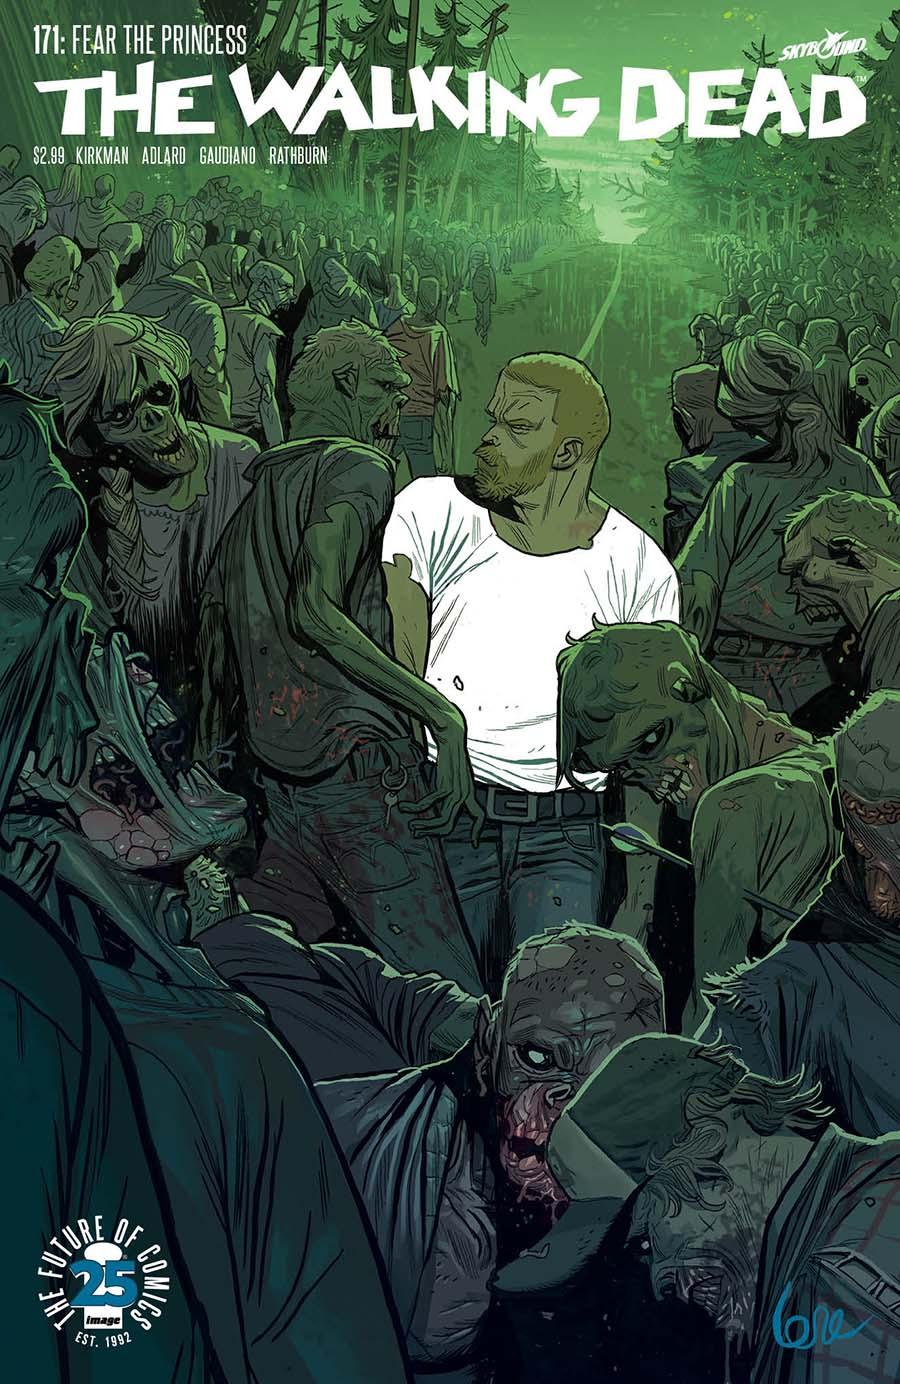 The Walking Dead #164 Image Comics CB14161